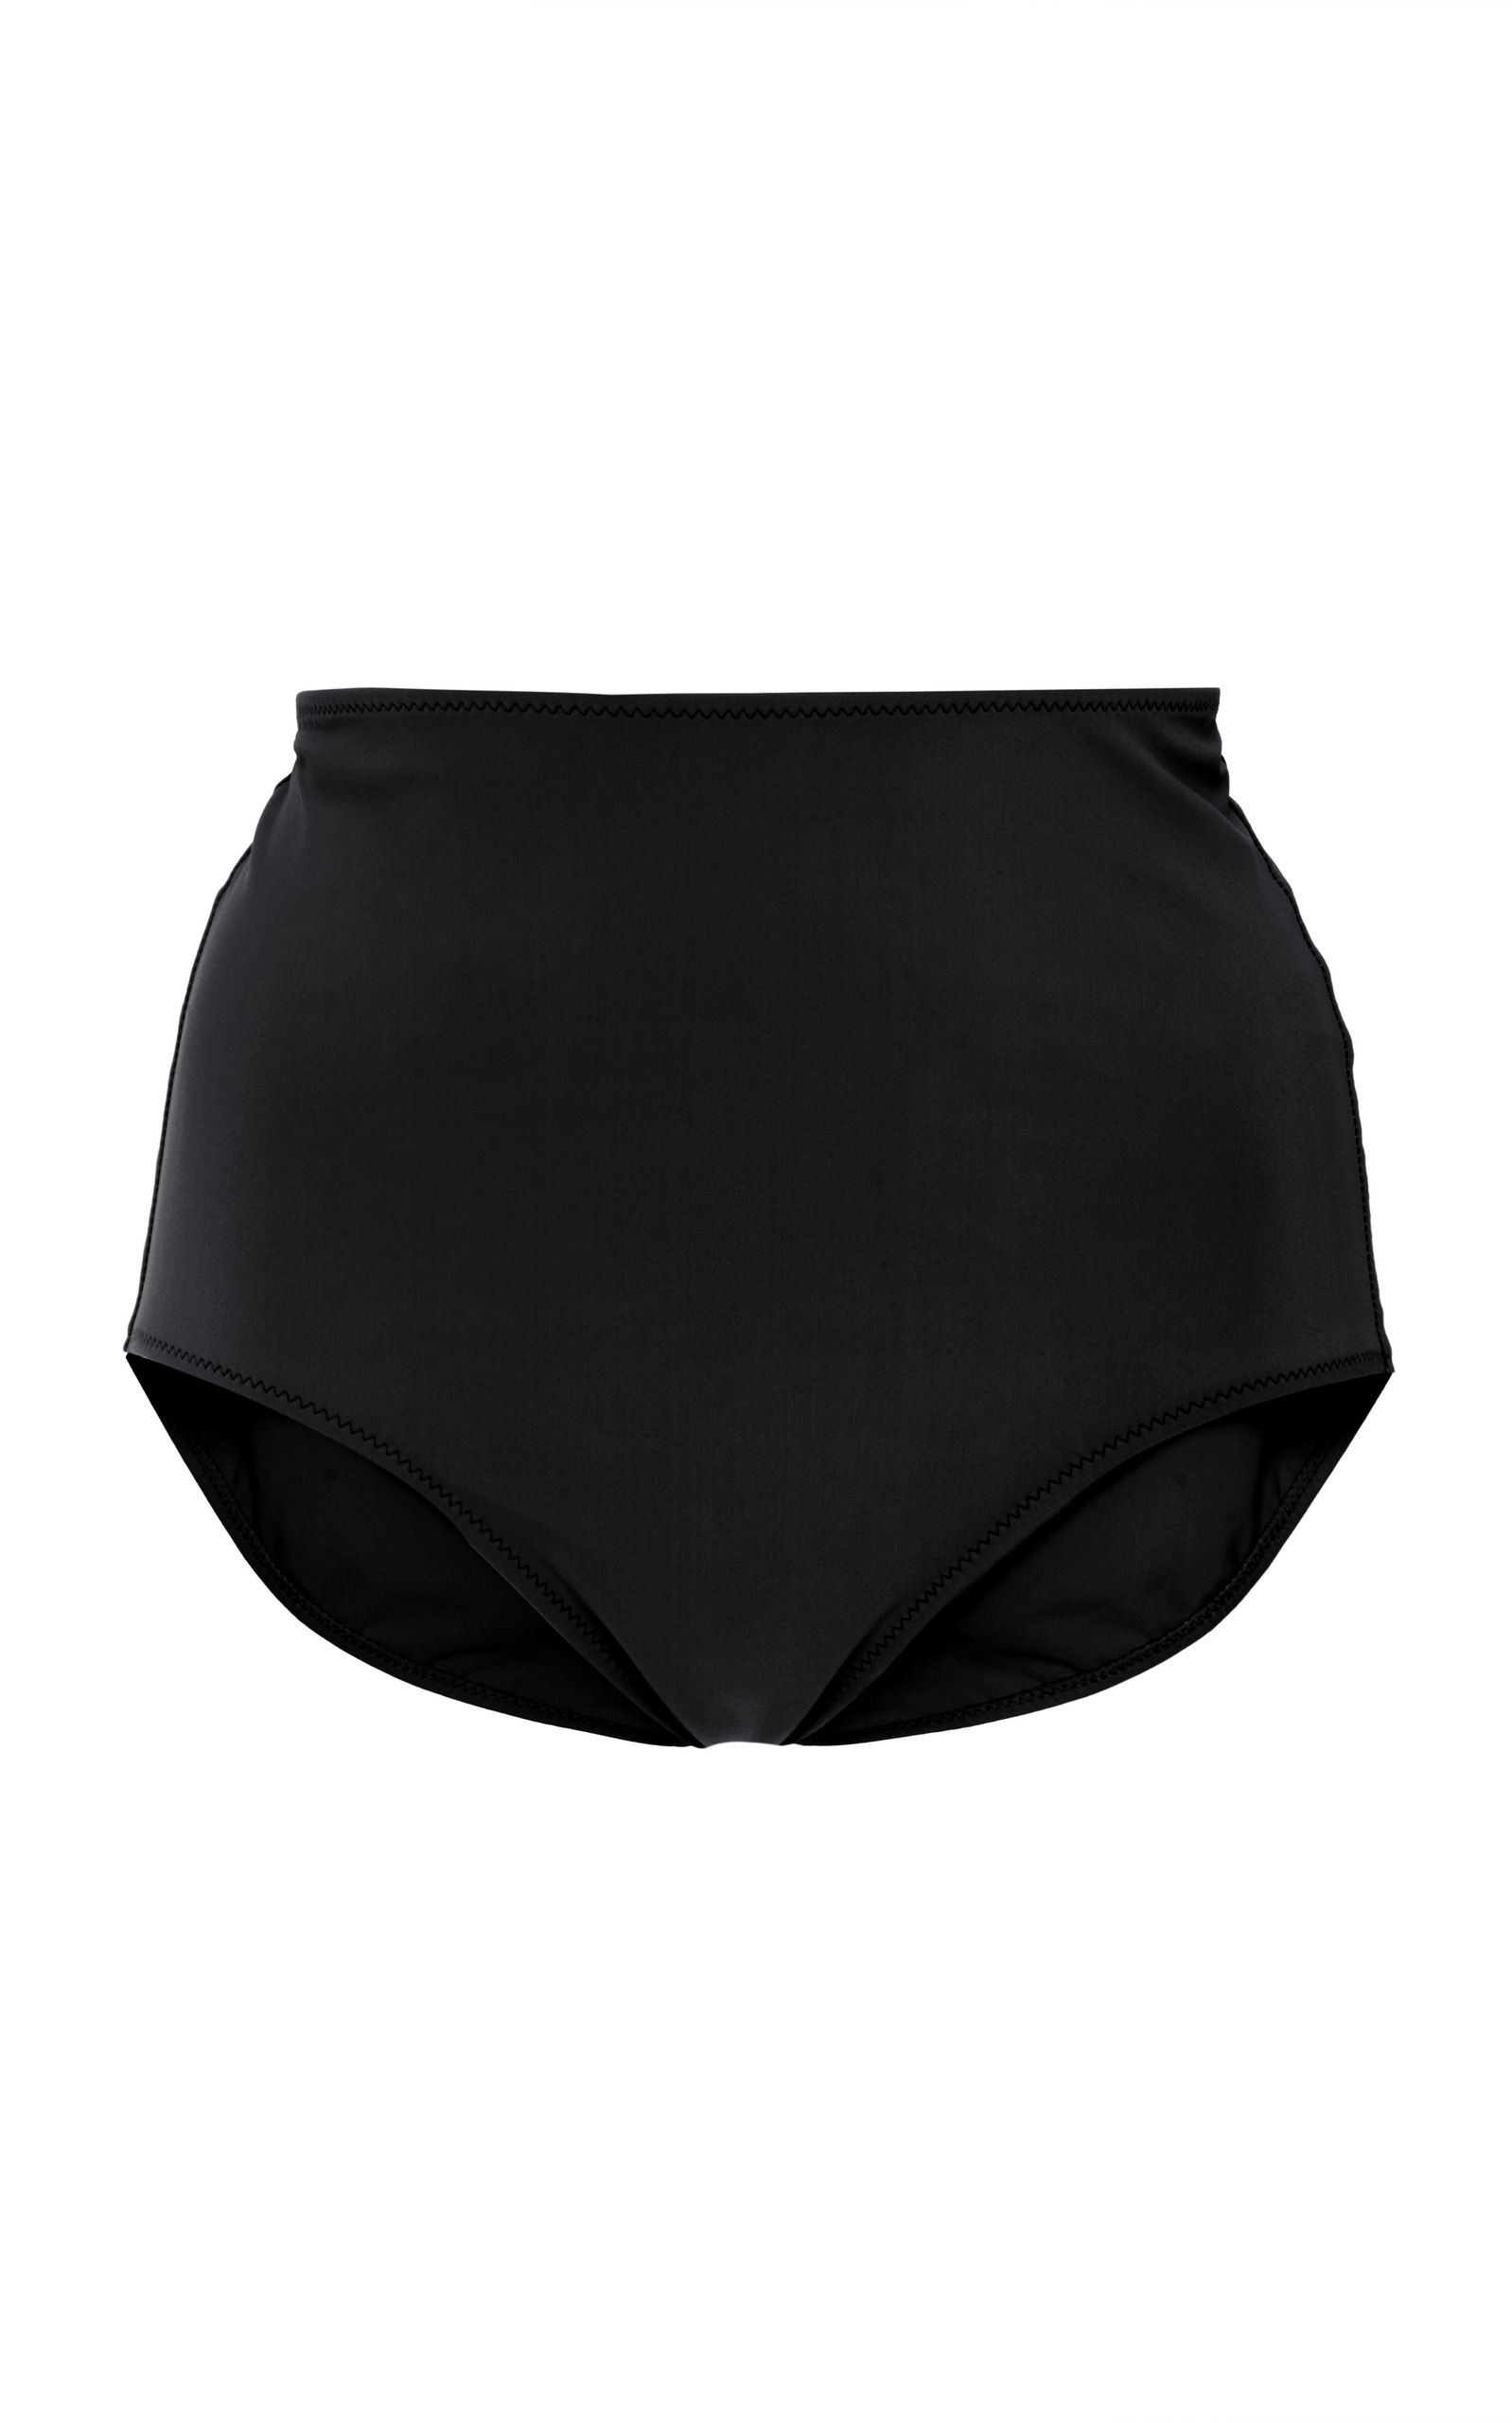 556ffe9d42 Mallory High Rise Hipster Bikini Bottoms